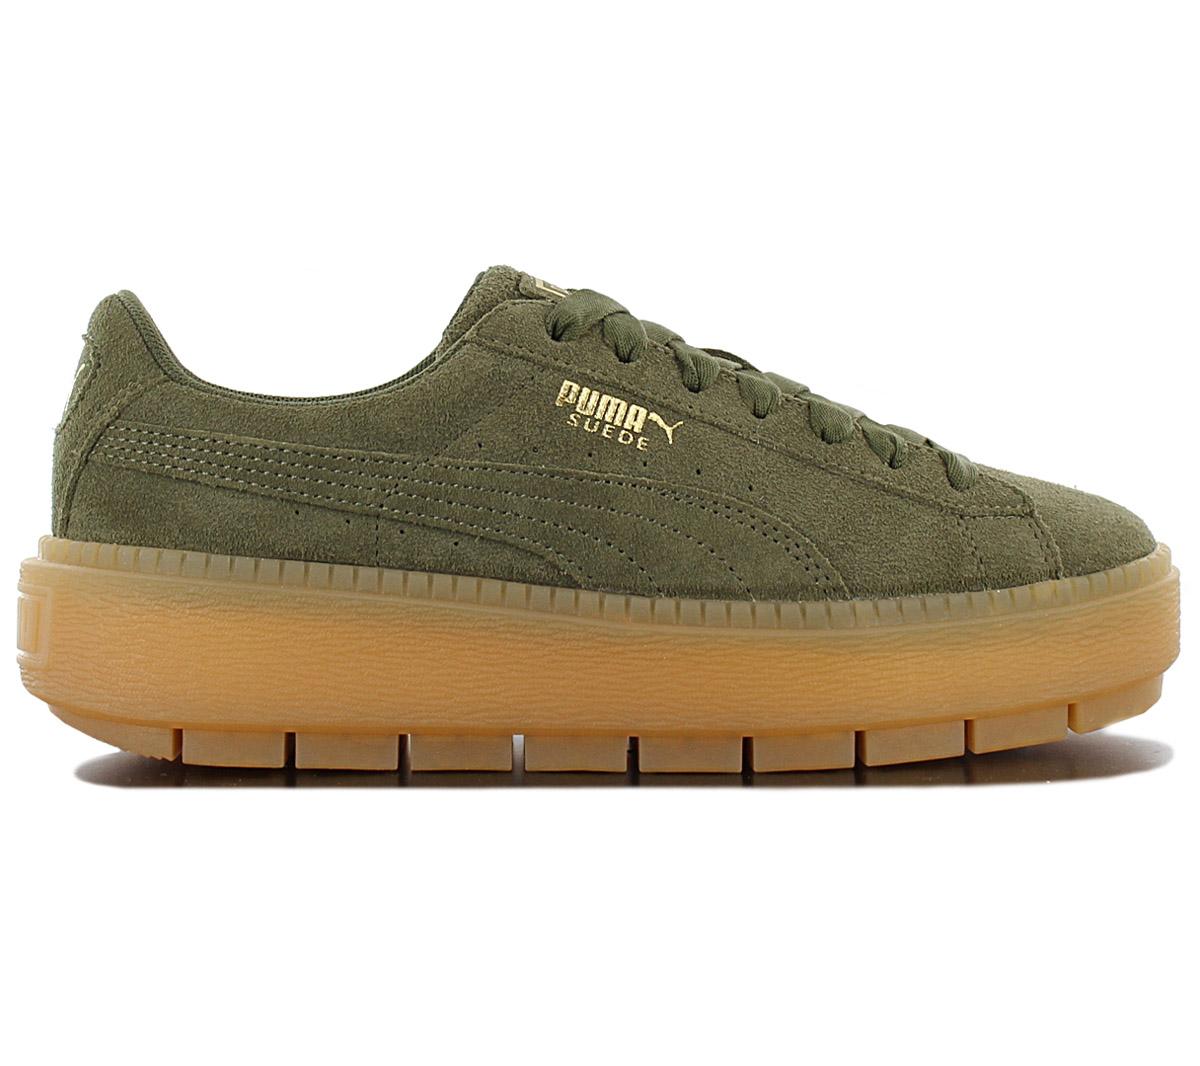 best service 84371 30e3b Details about Puma Platform Trace Women's Sneaker 365830-03 Green Platform  Trainers New